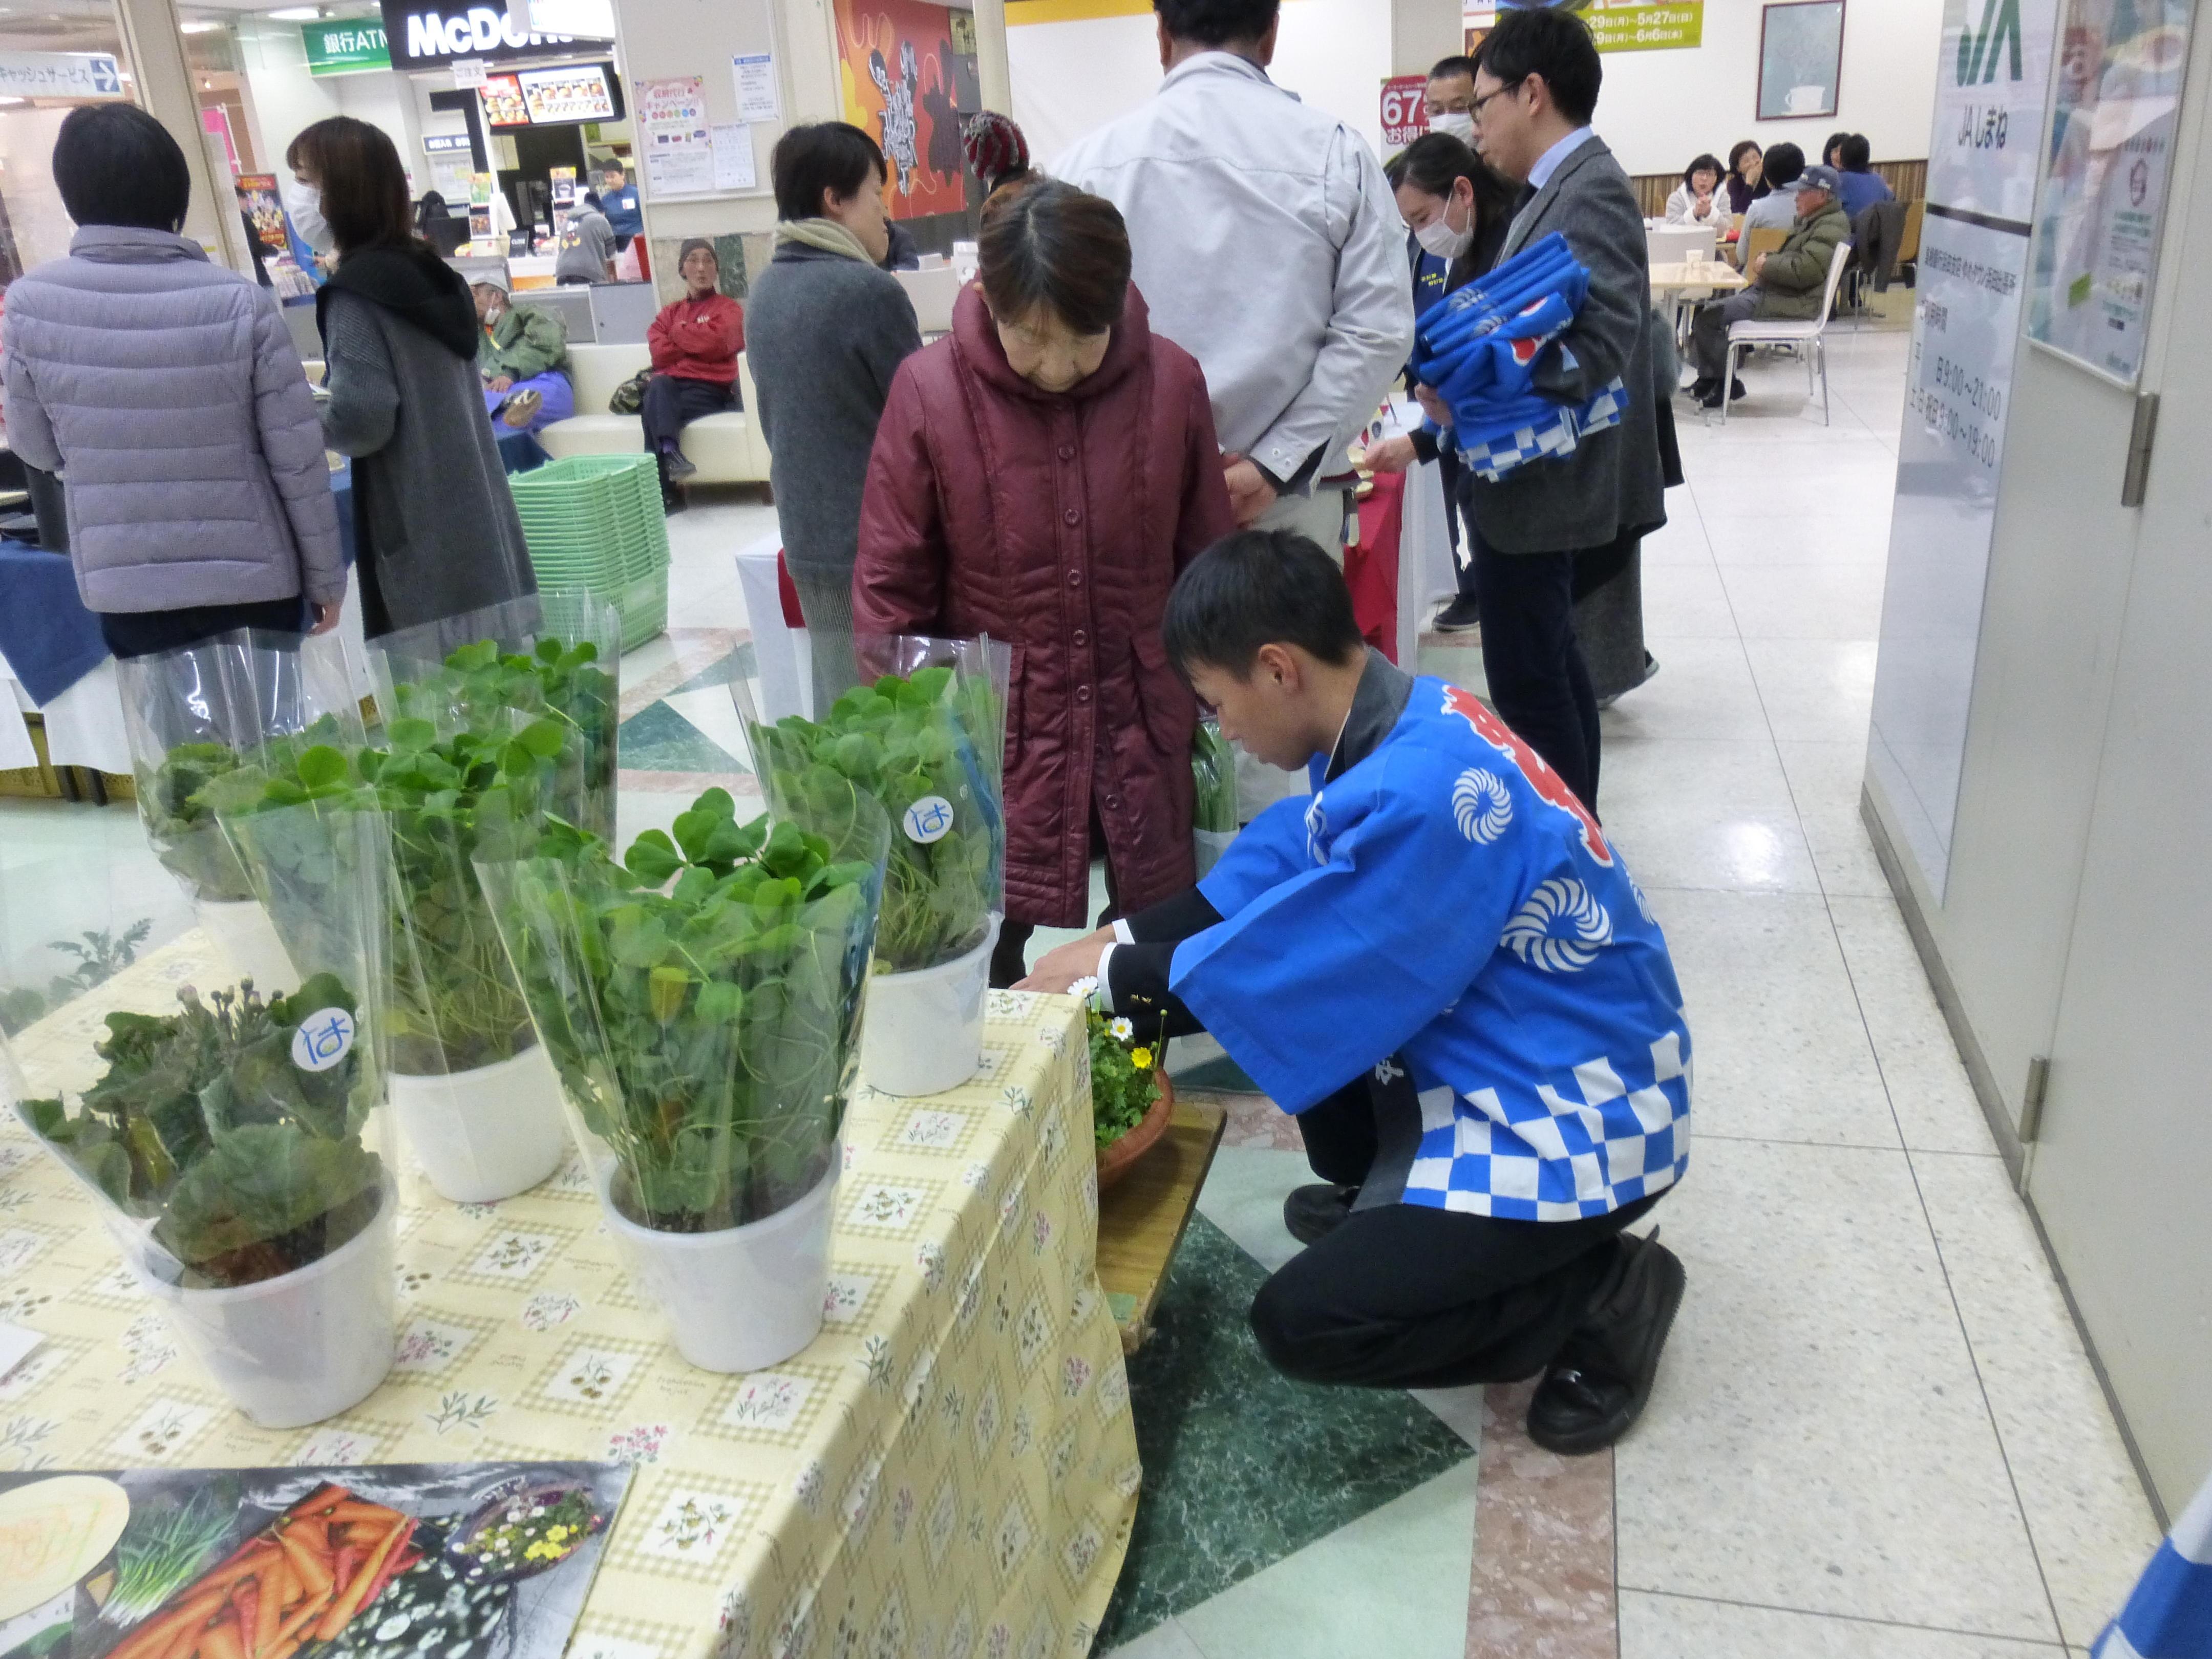 http://www.shimanet.ed.jp/hamadayougo/news/P1050155.JPG